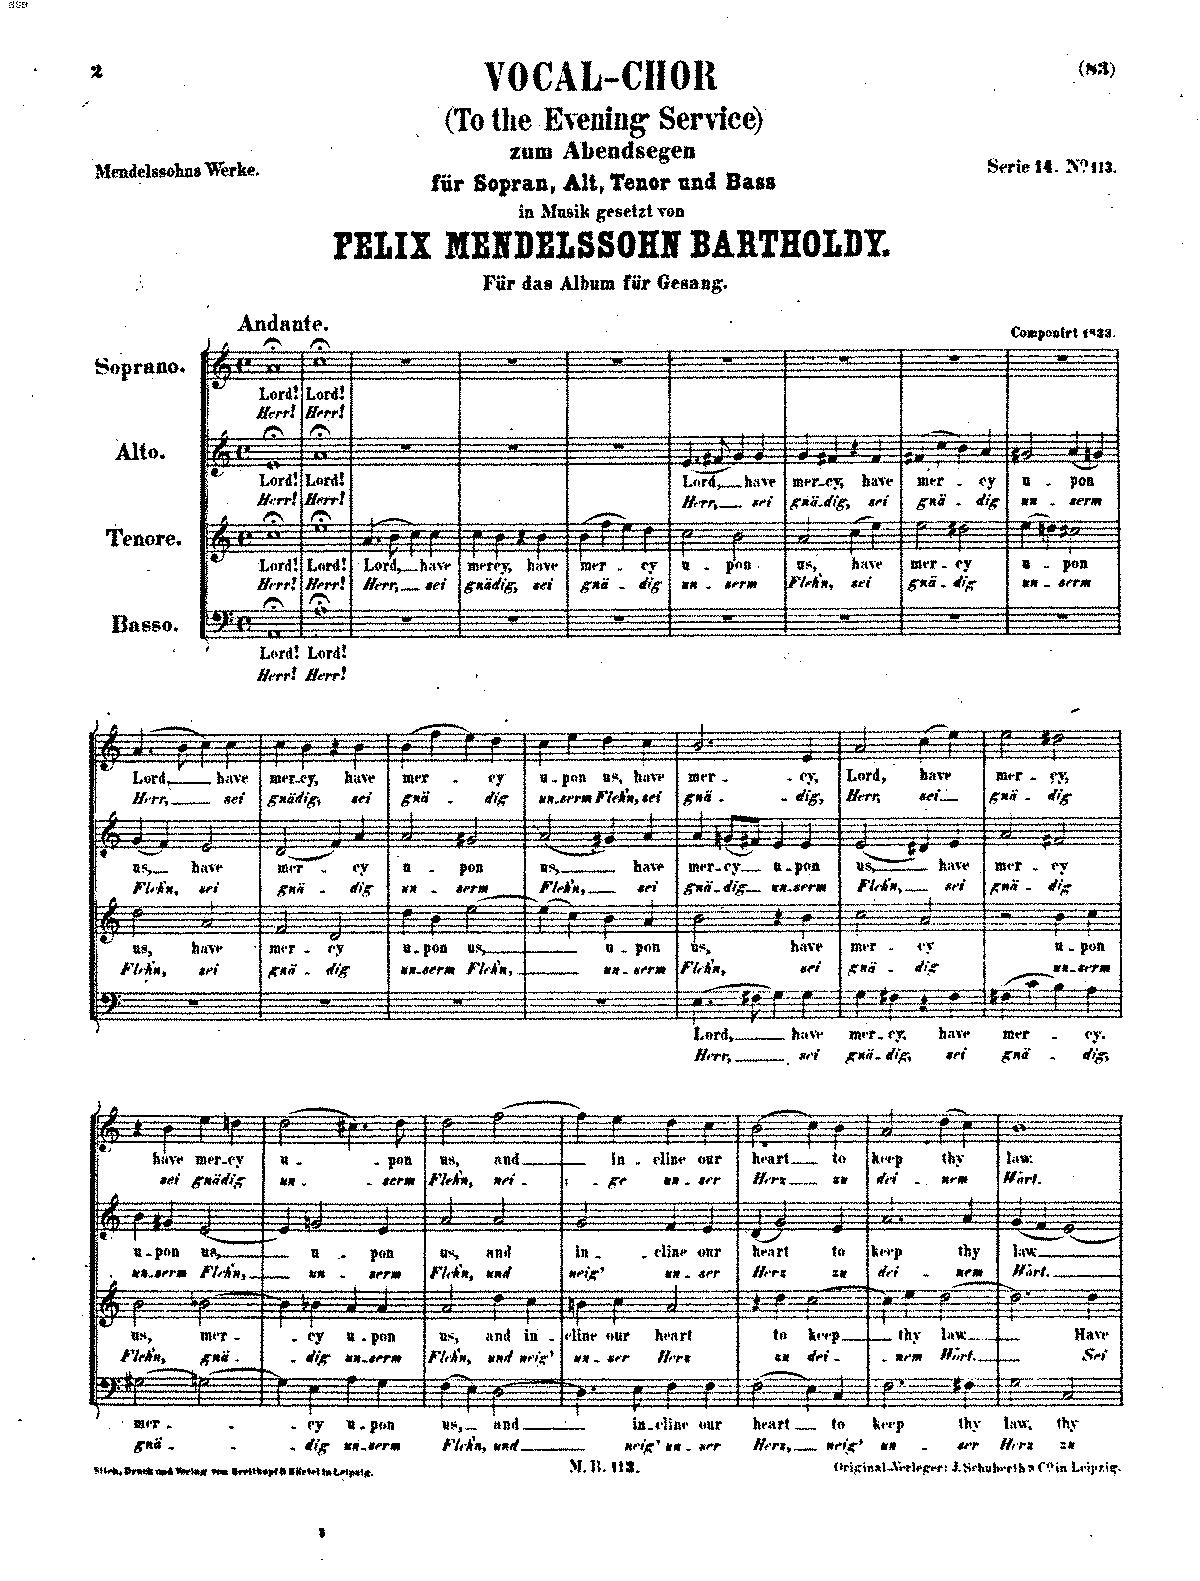 chorus grant wiki